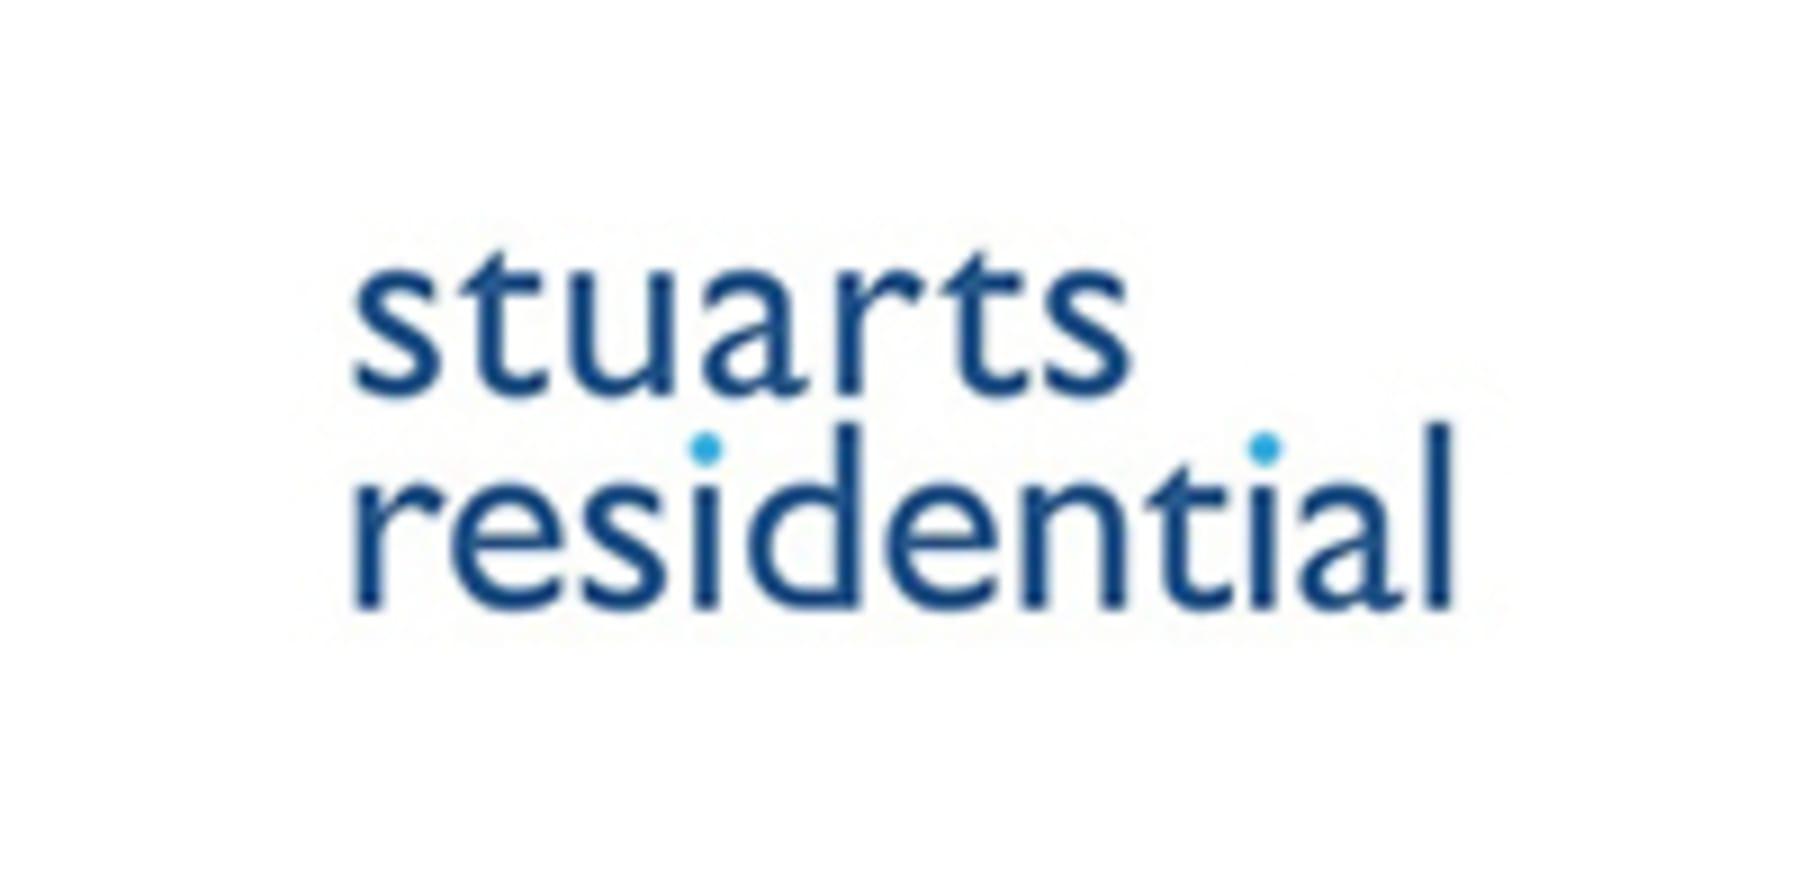 Stuarts Residential